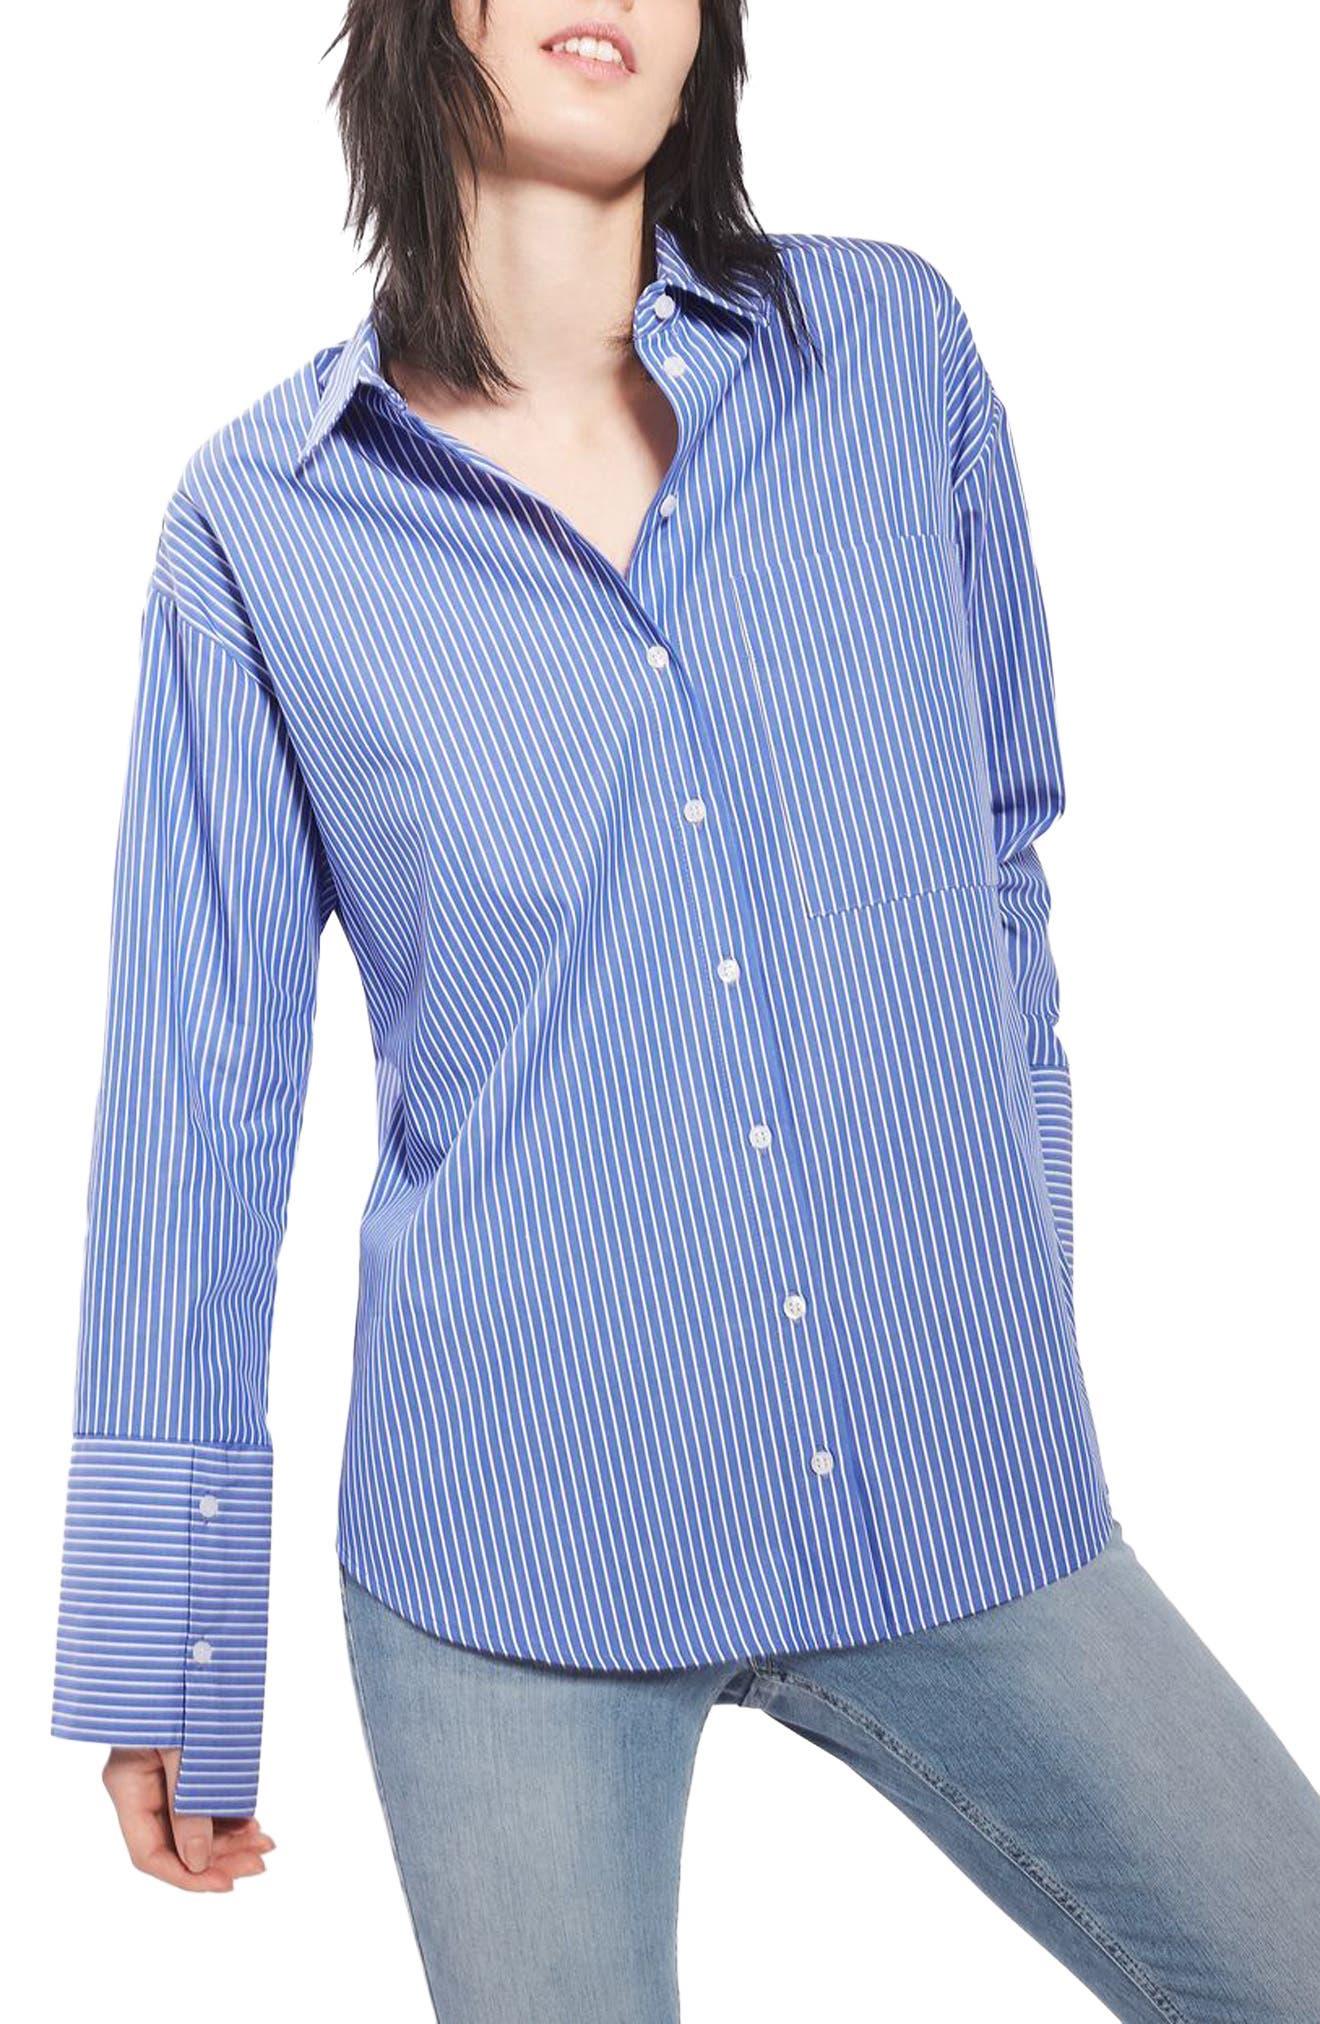 Main Image - Topshop Deep Cuff Stripe Shirt